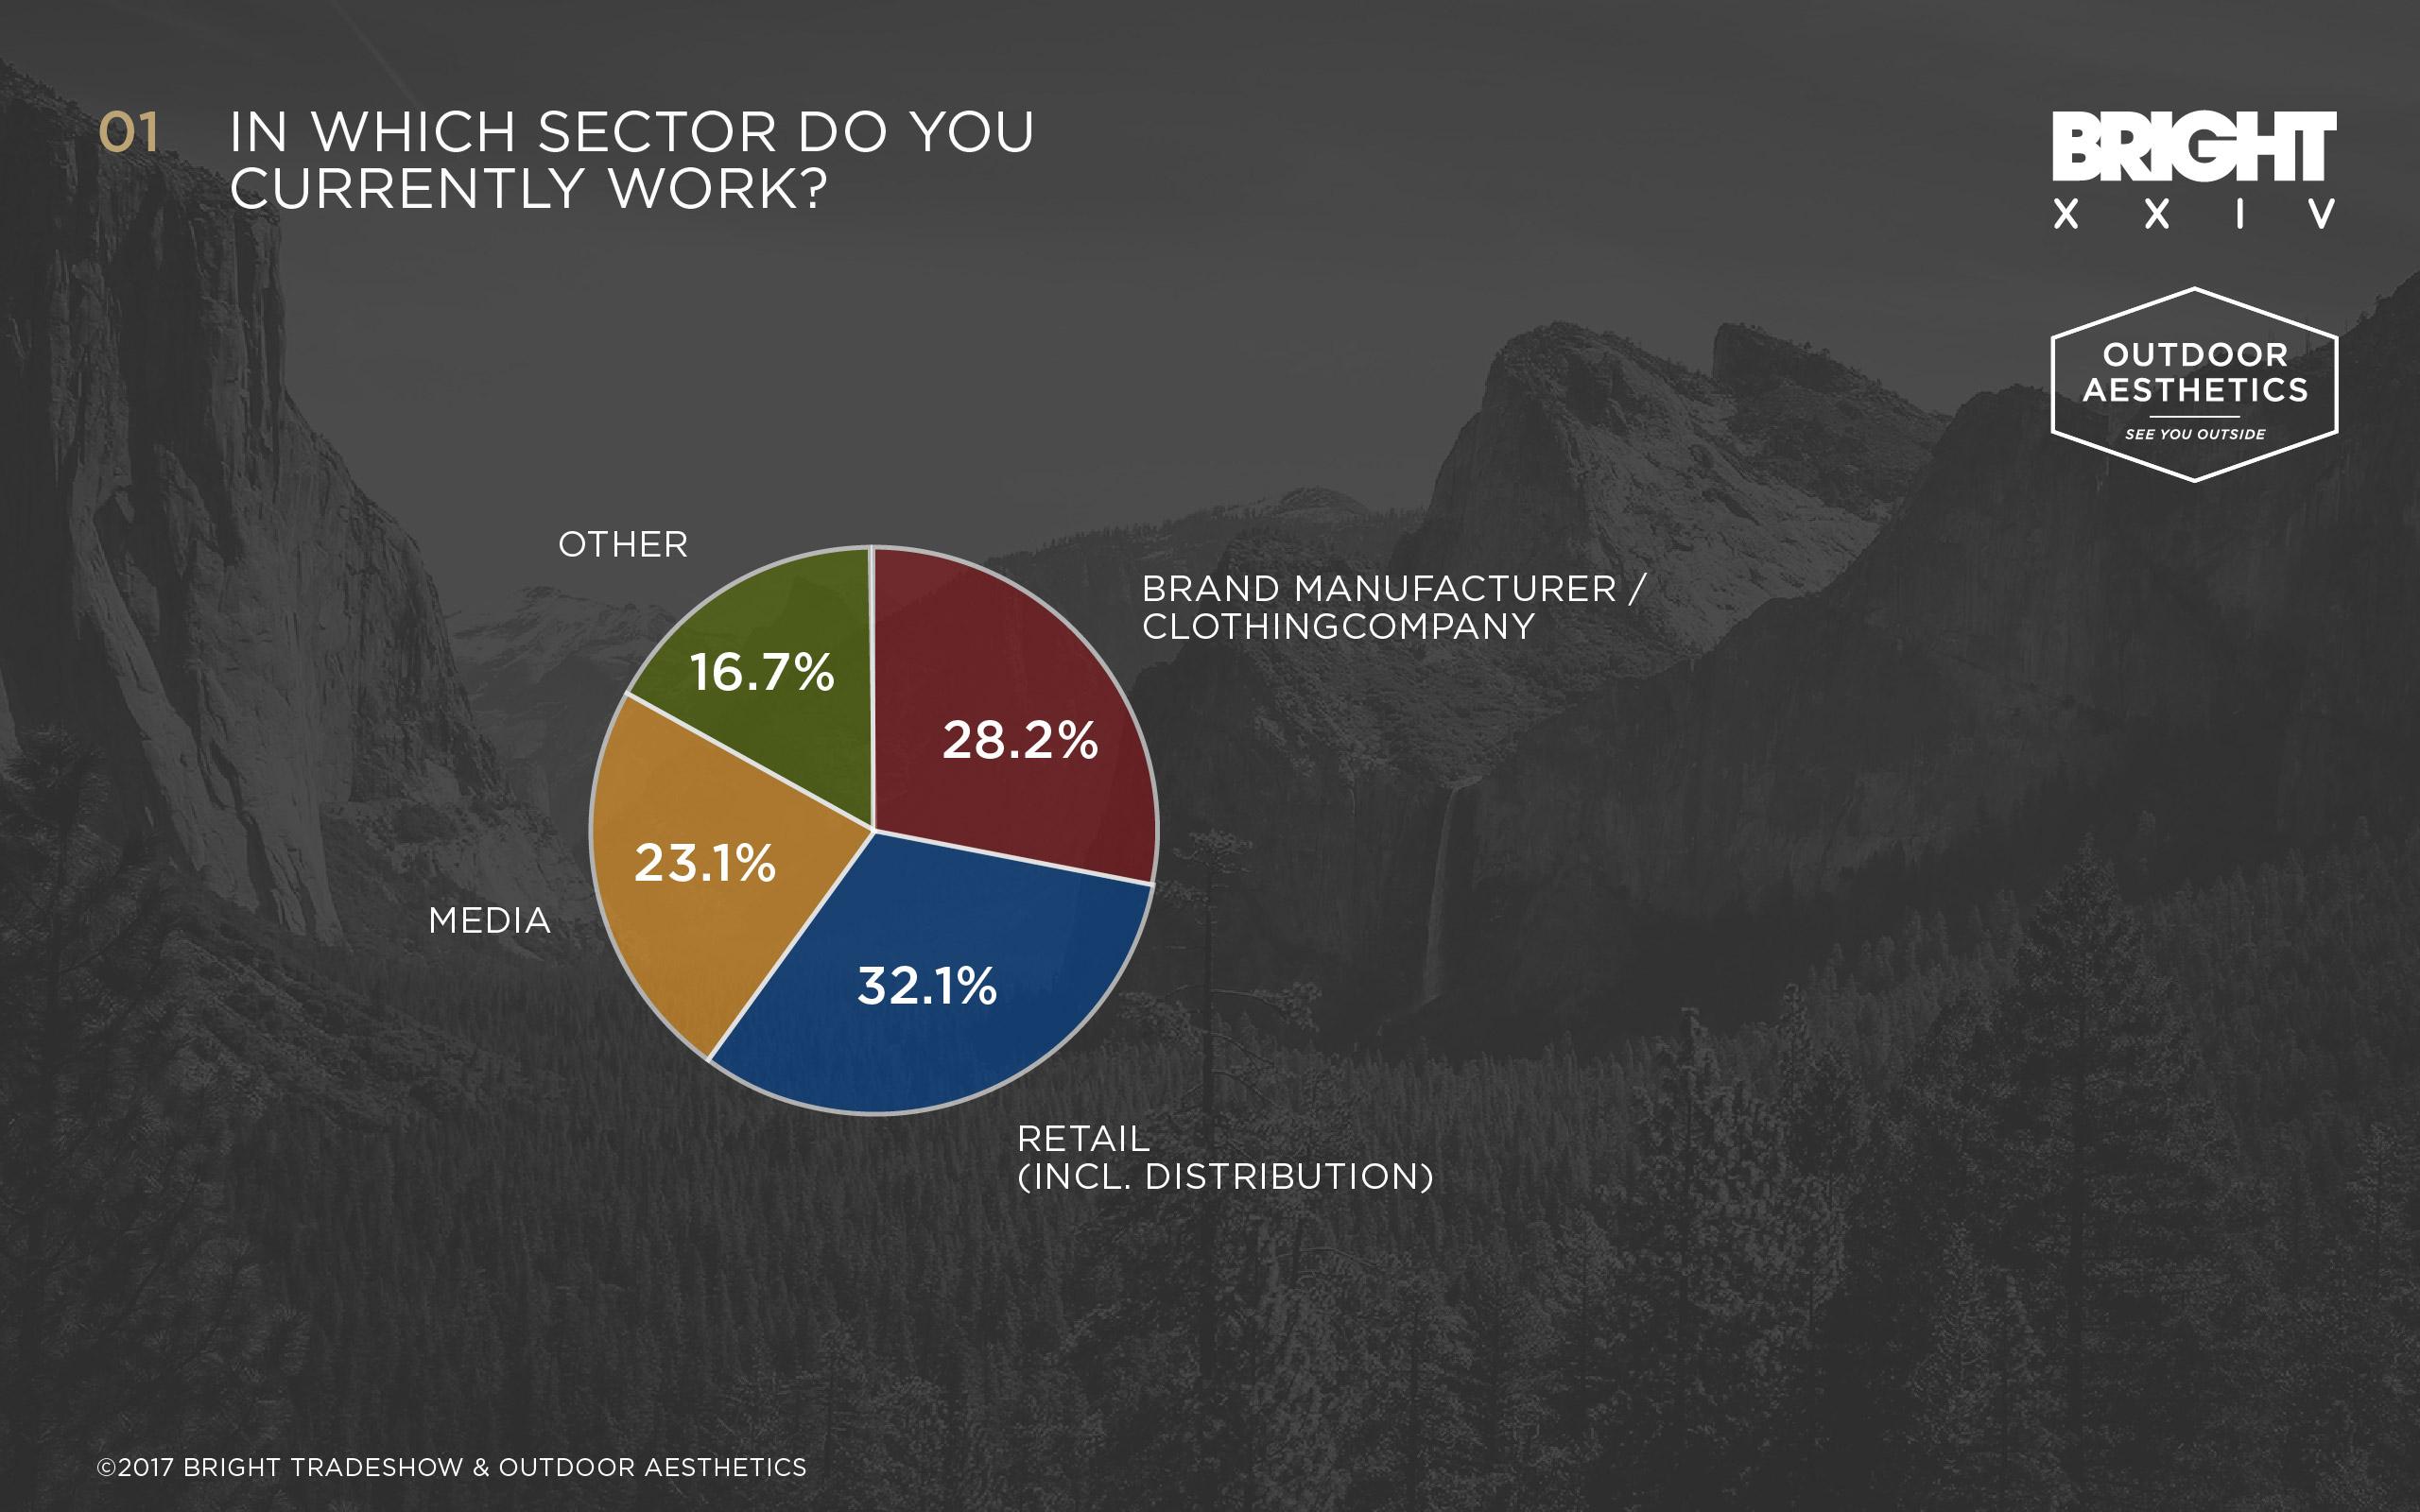 outdoor-aesthetics-trend-survey-2017-02